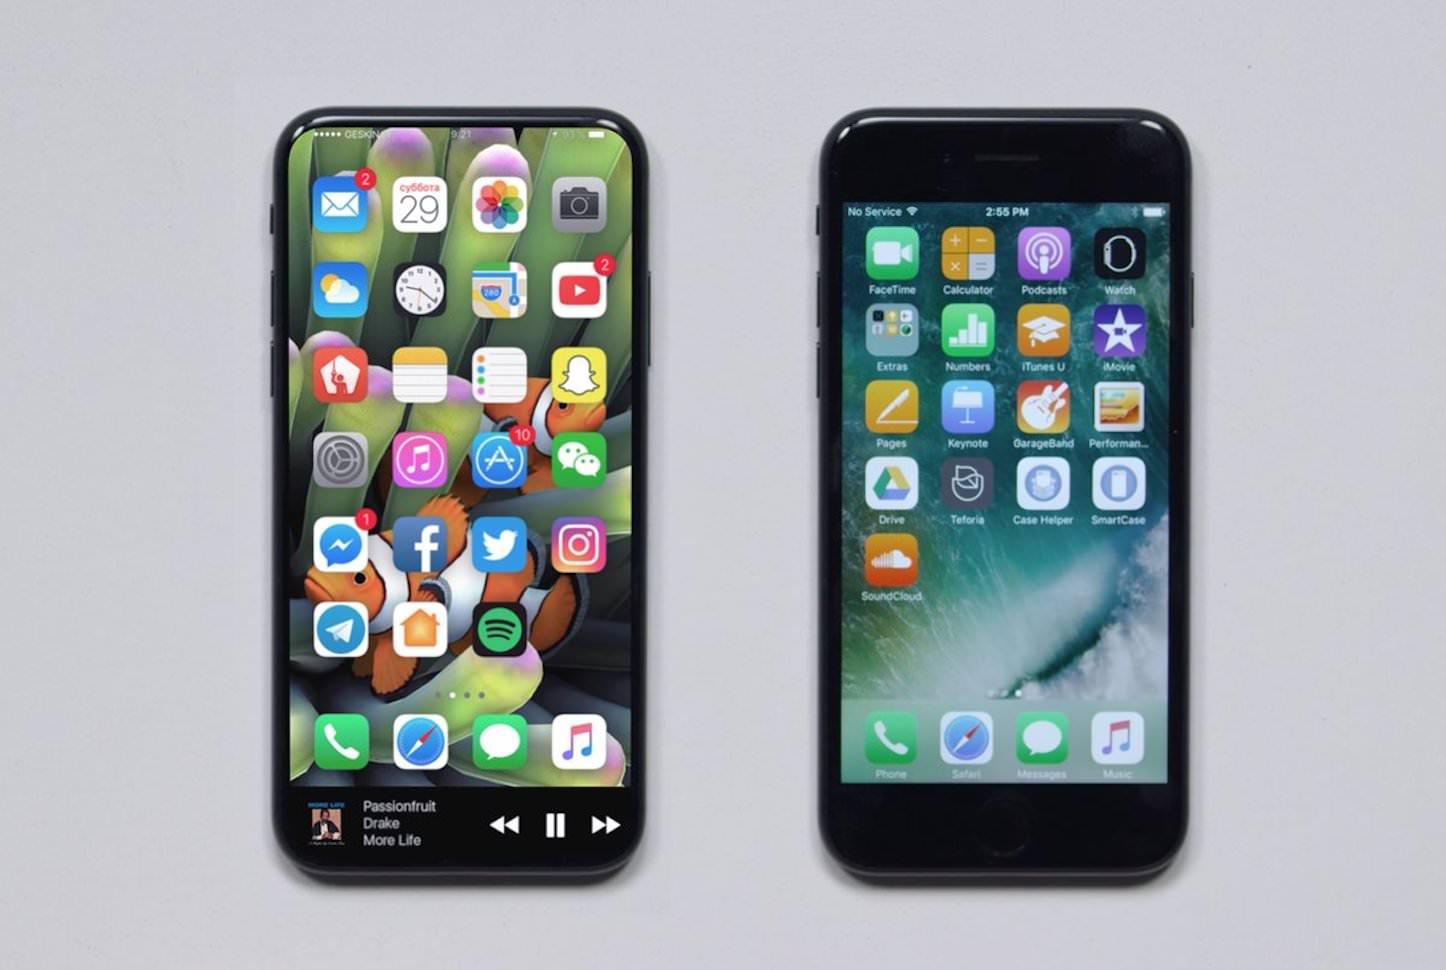 iphone-8-iphone-7-comparison-1.jpg